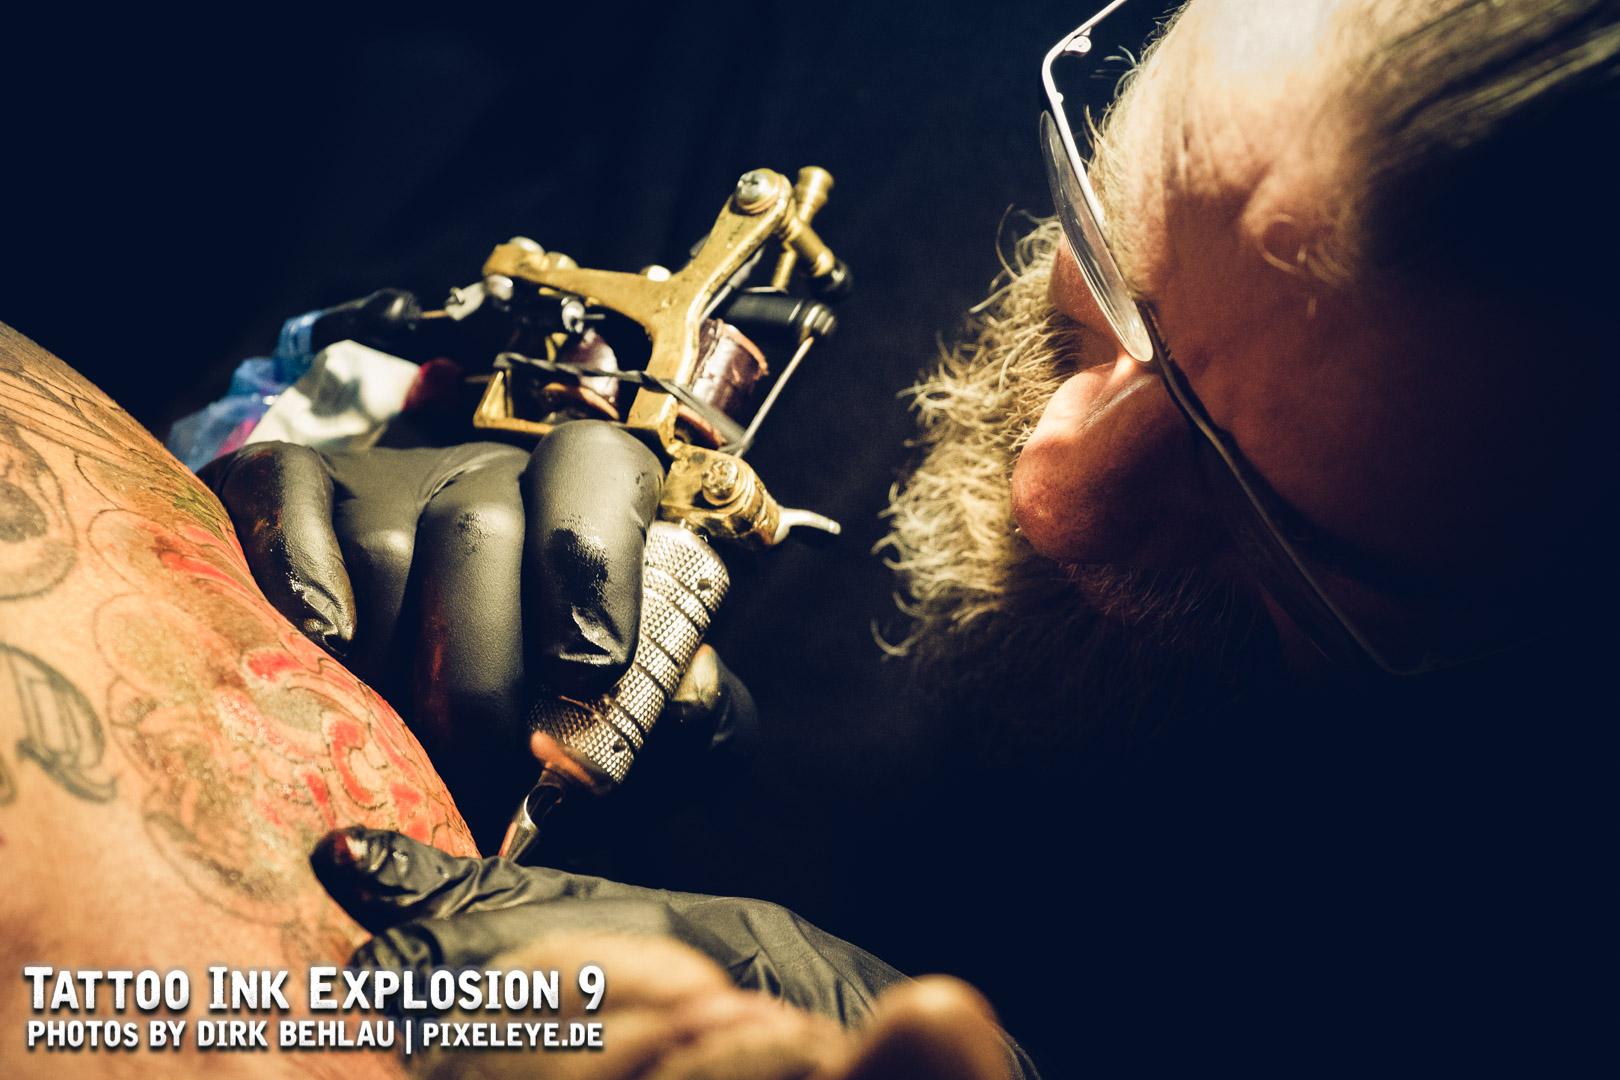 Tattoo Ink Explosion 2018 WEB by Dirk Behlau-1235.jpg